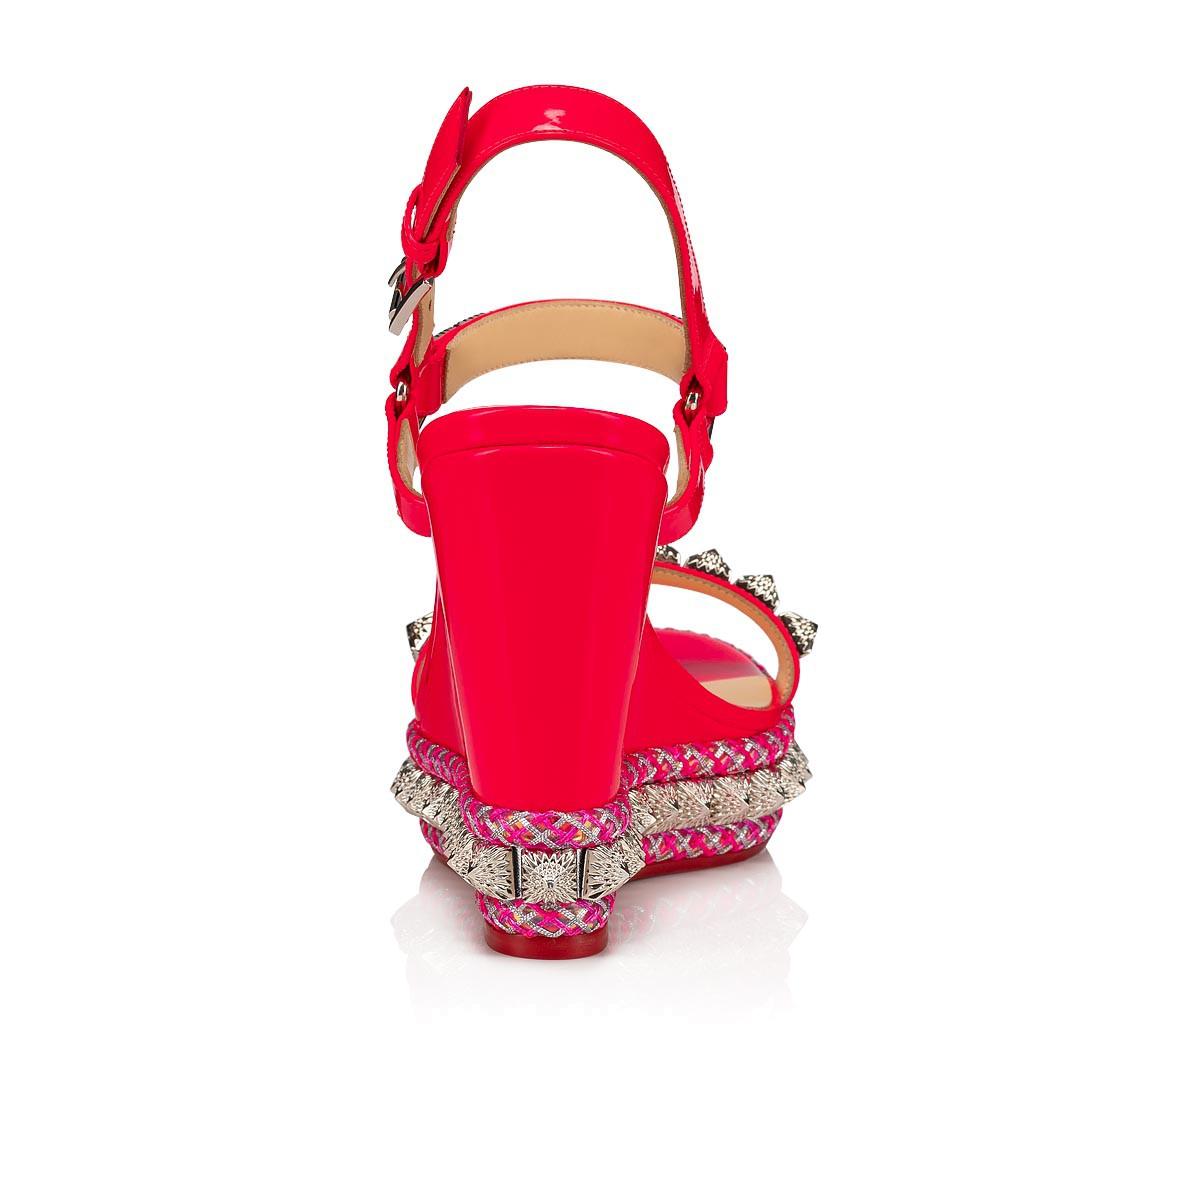 Shoes - Pira Ryad - Christian Louboutin